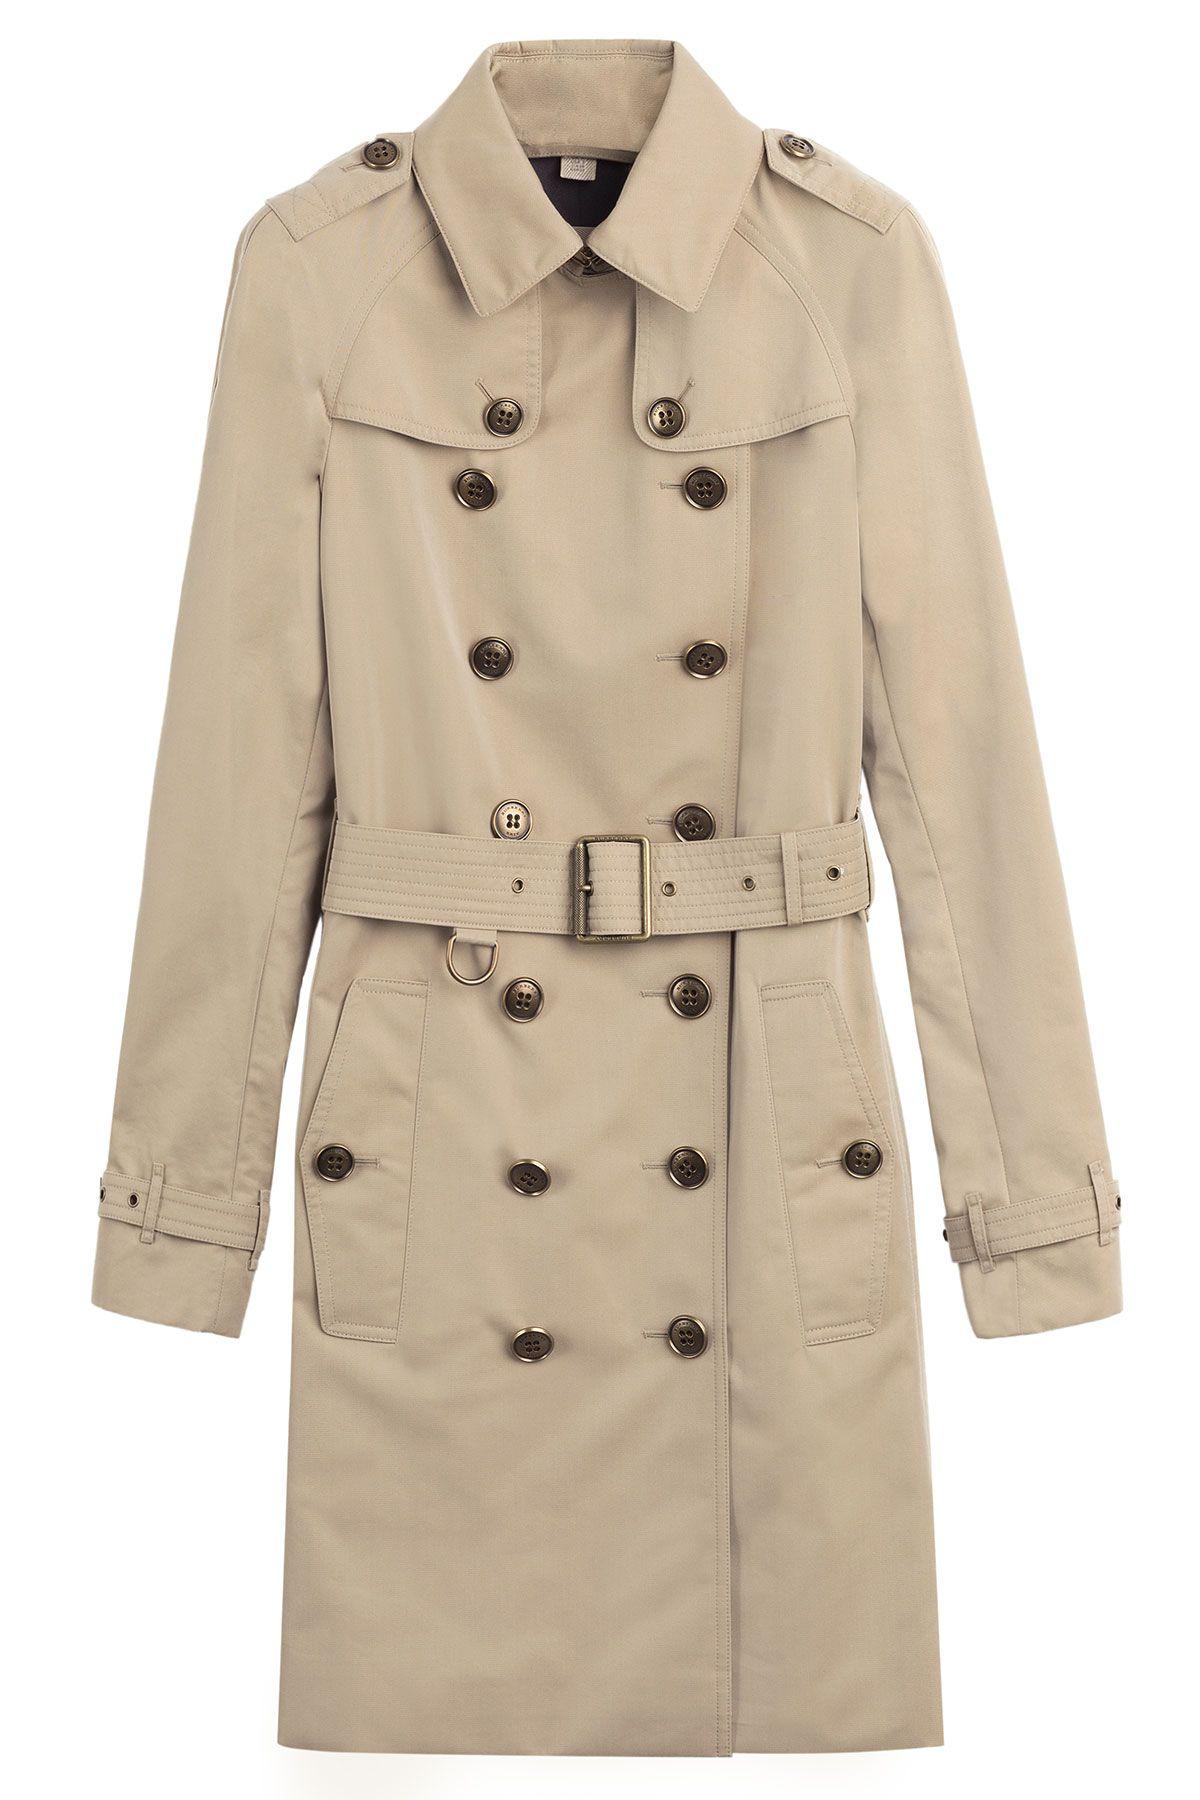 "Burberry Brit Felden Cotton Blend Trench Coat, $1,495; &lt;a href=""http://www.stylebop.com/product_details.php?id=607252""&gt;stylebop.com&lt;/a&gt;   <!--EndFragment-->"